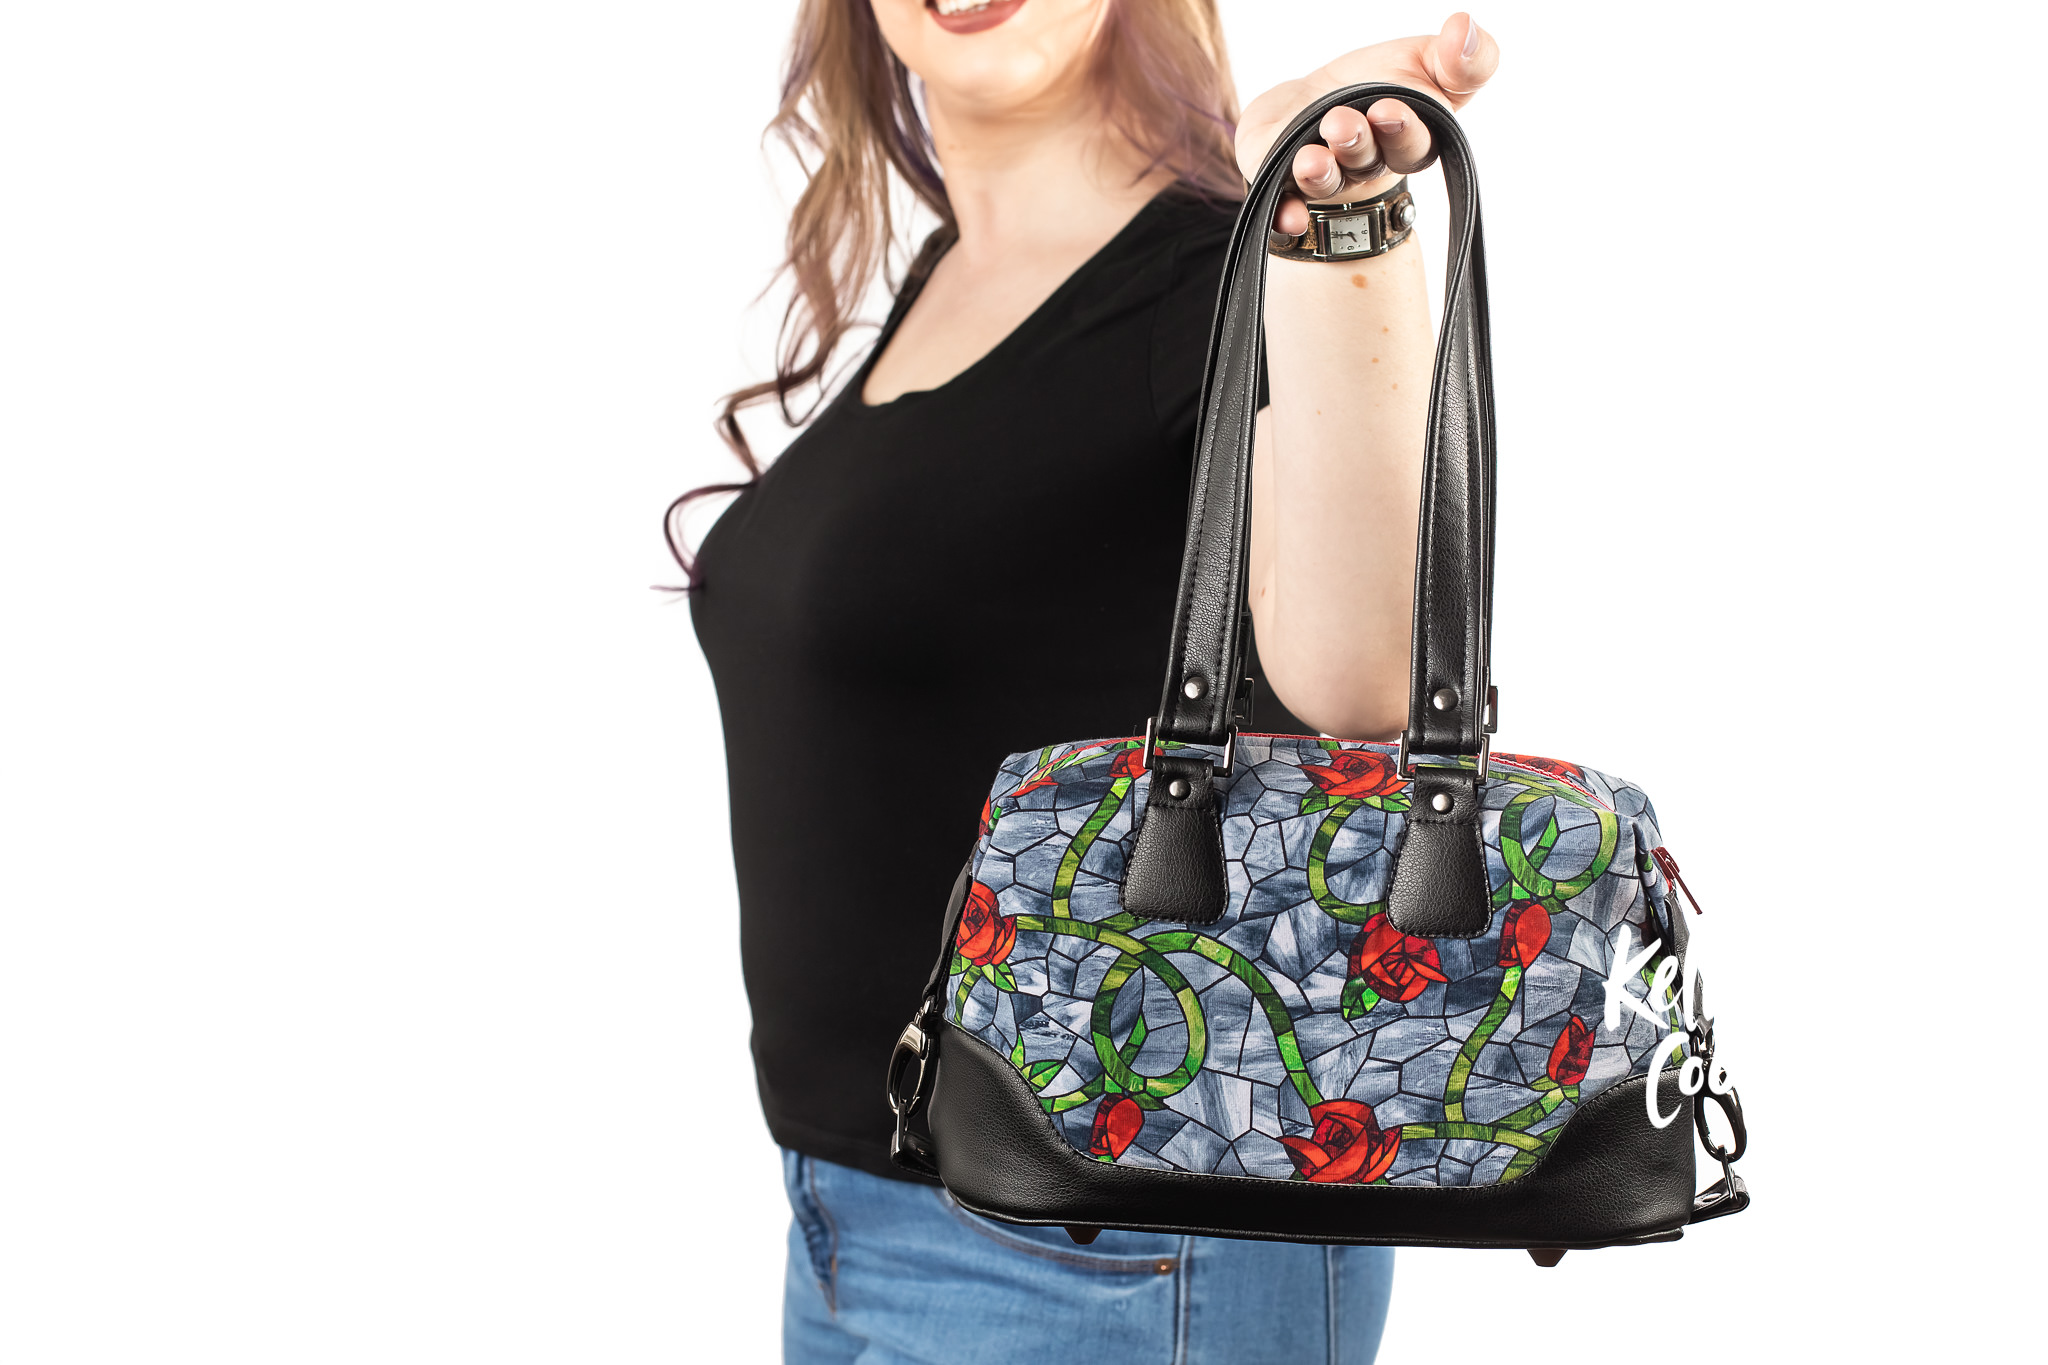 Woman holding a fun, geeky purse